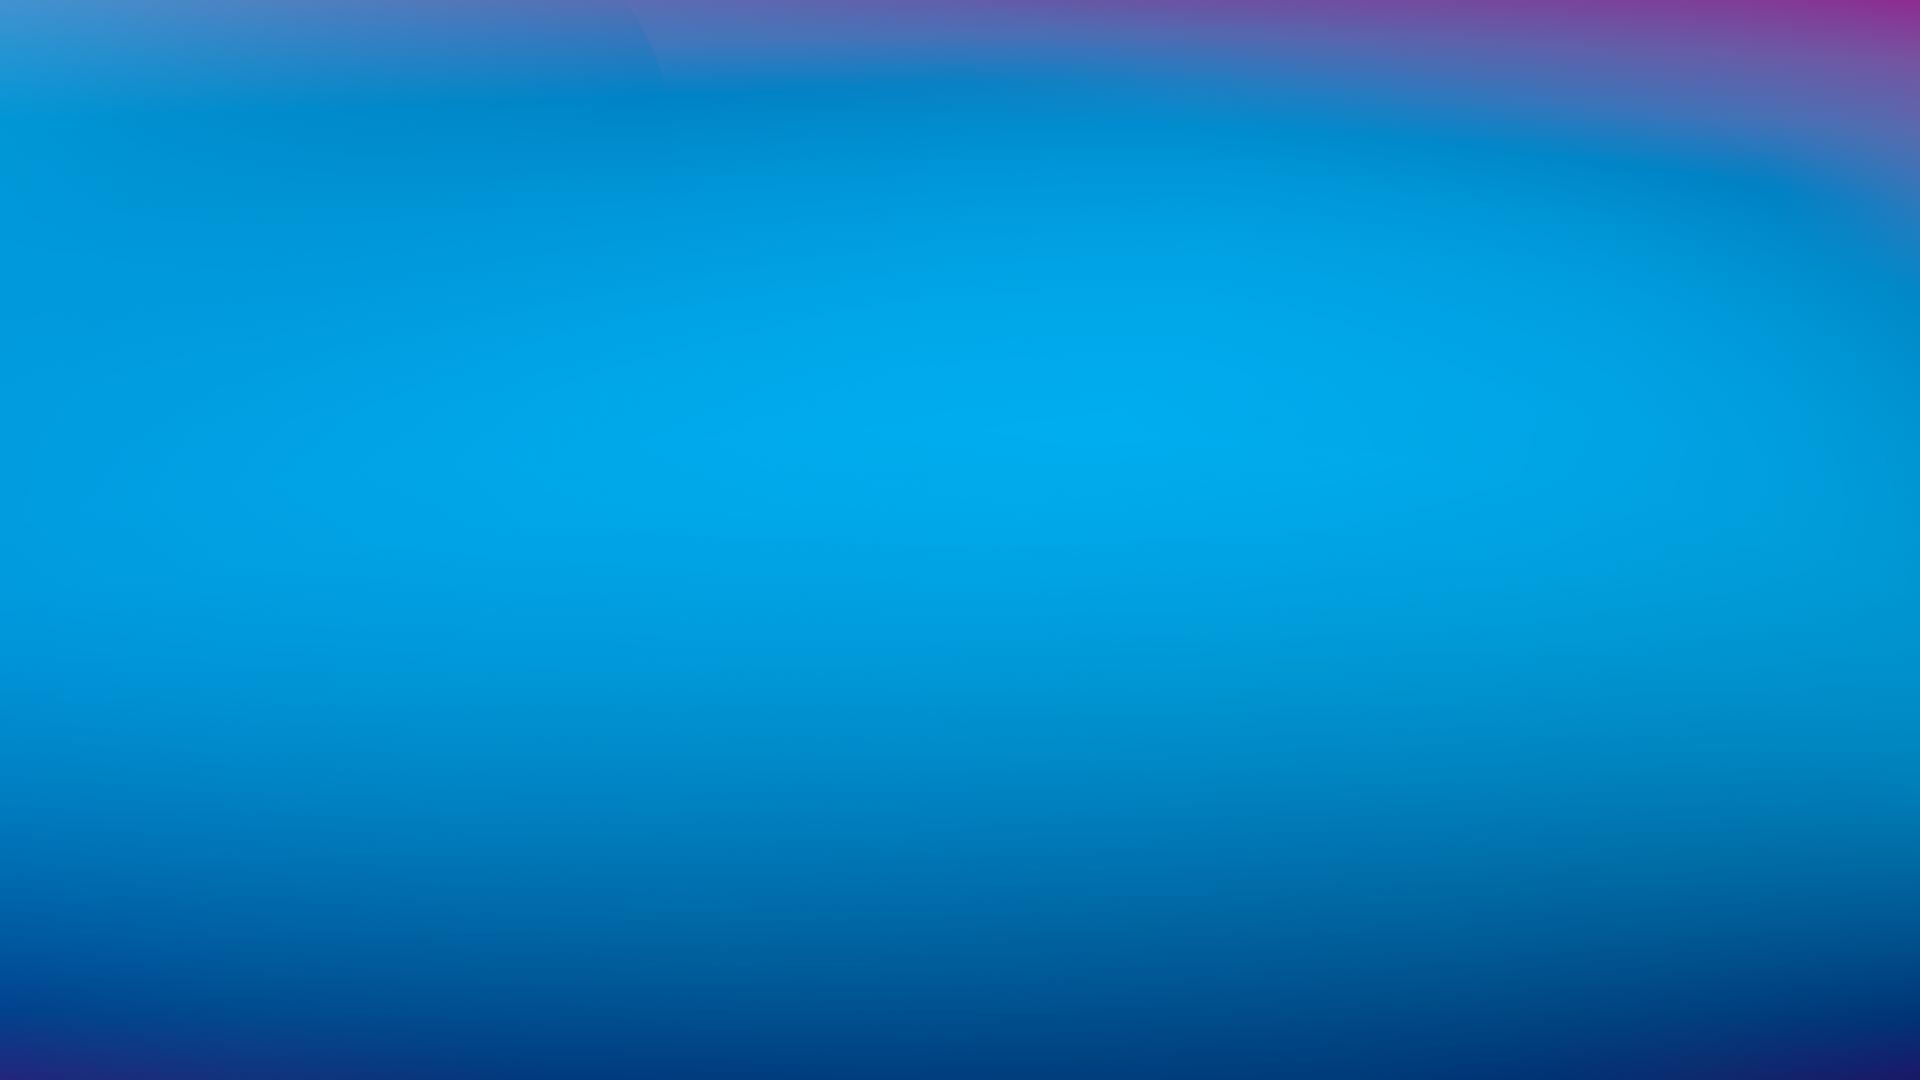 Free Download Background Banner Images Wallpaper HD Wide [2125x1200] For  Your Desktop, Mobile & Tablet   Explore 46+ Wallpaper Banners   YouTube Banner  Wallpaper, Iron Banner Wallpaper,